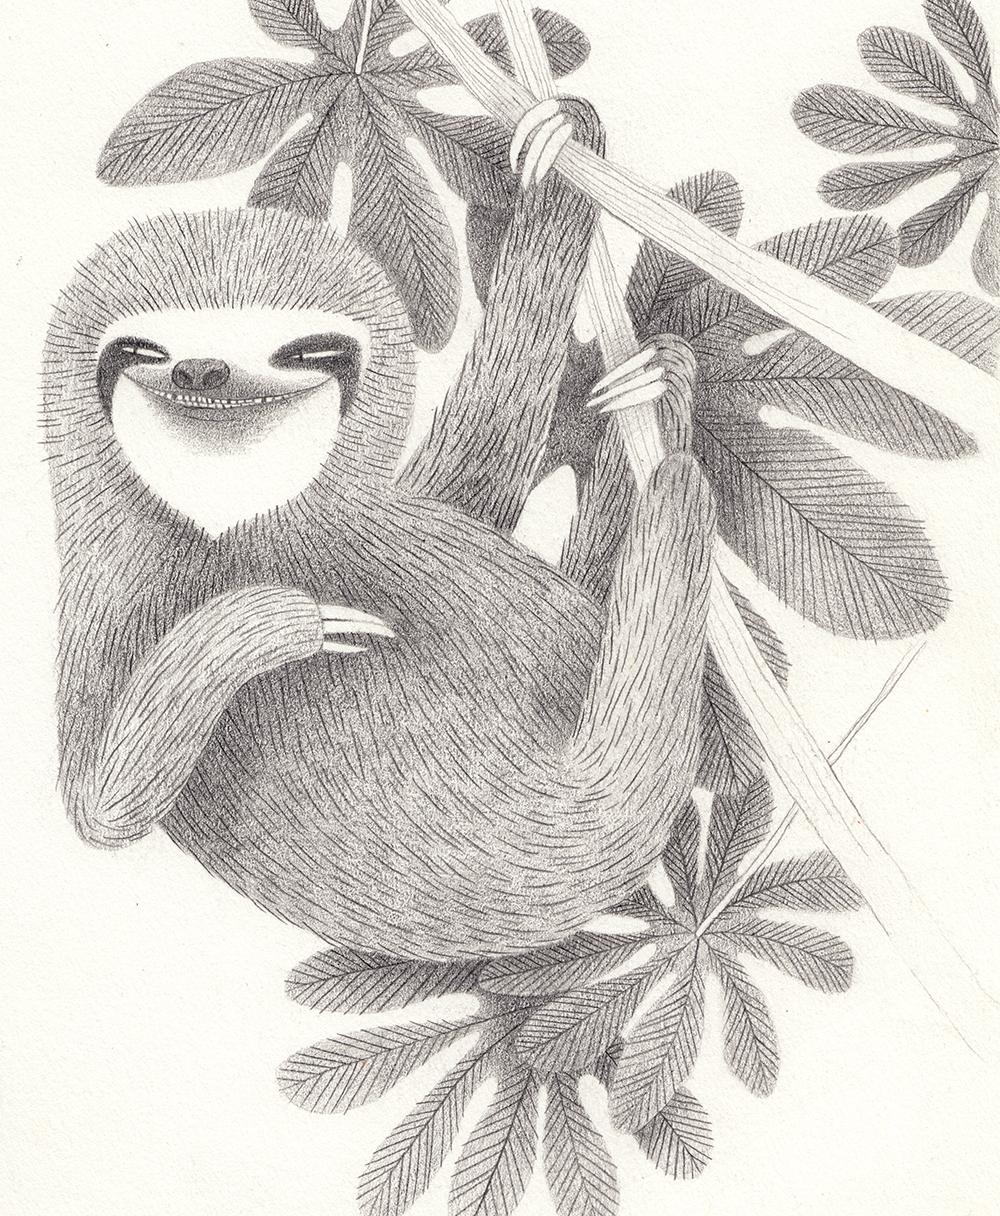 slothsketch_sm.jpg